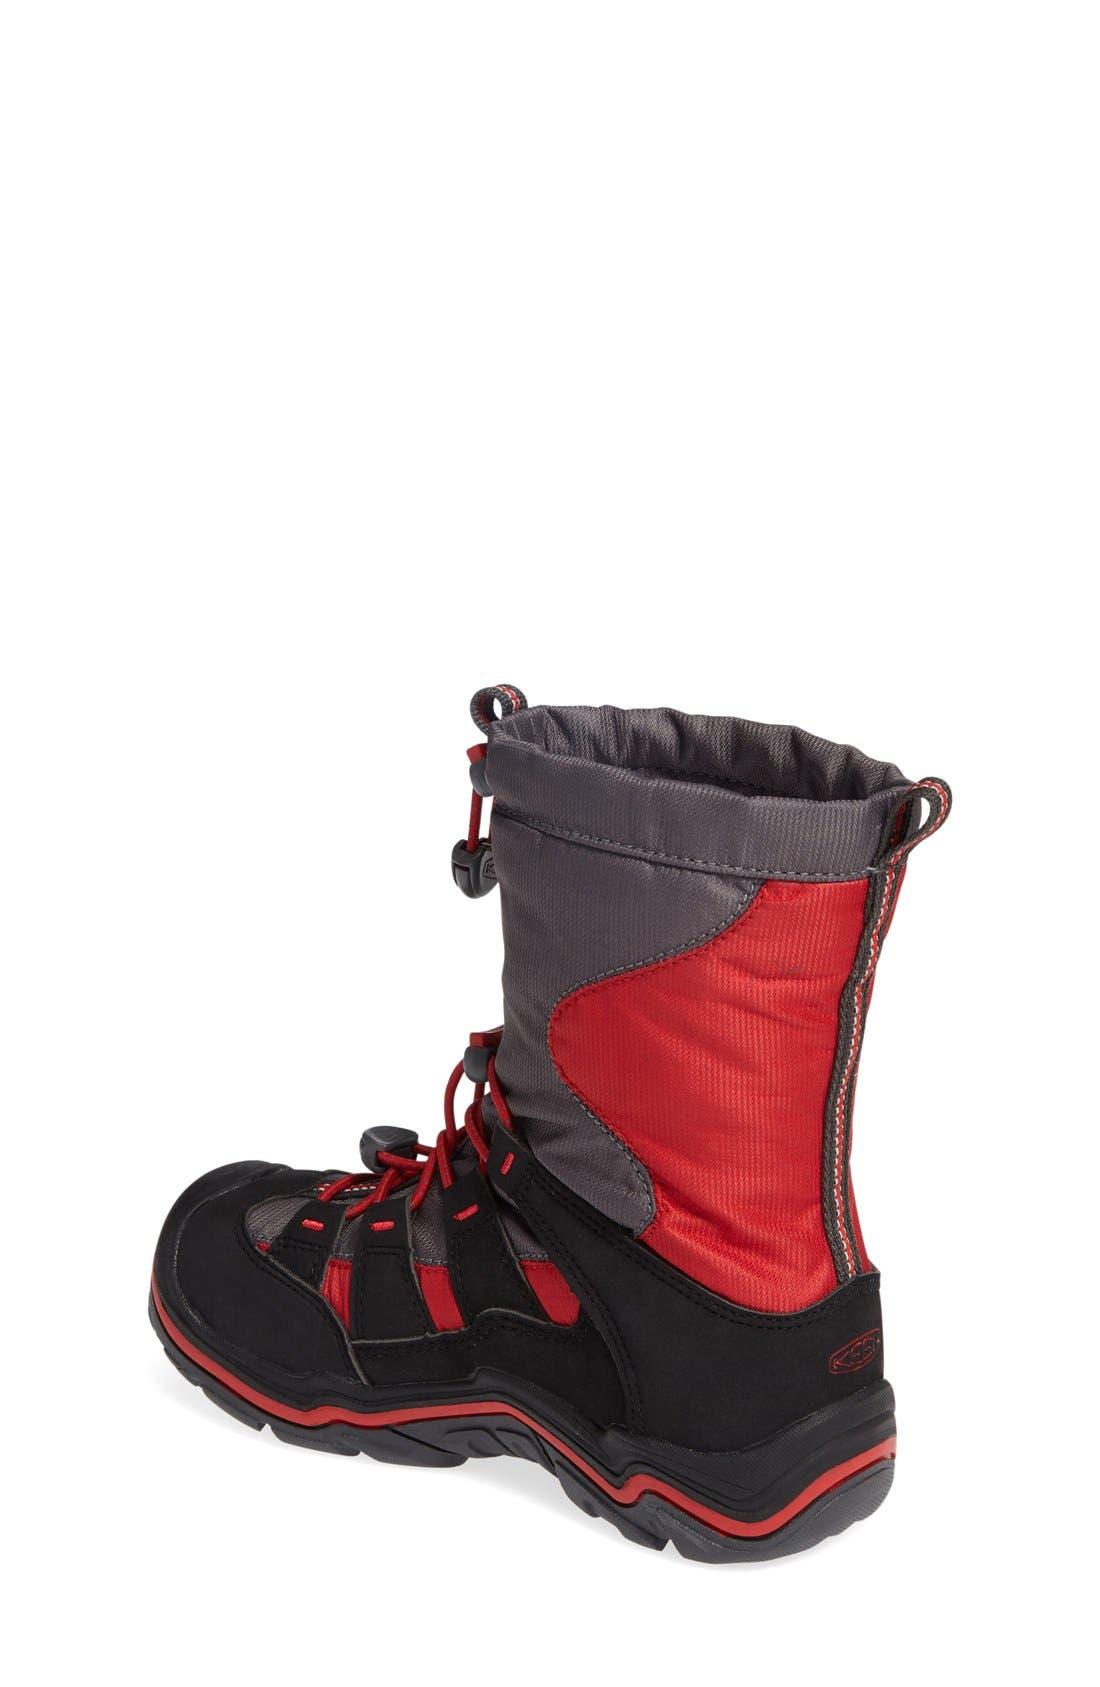 Winterport II Waterproof Boot,                             Alternate thumbnail 8, color,